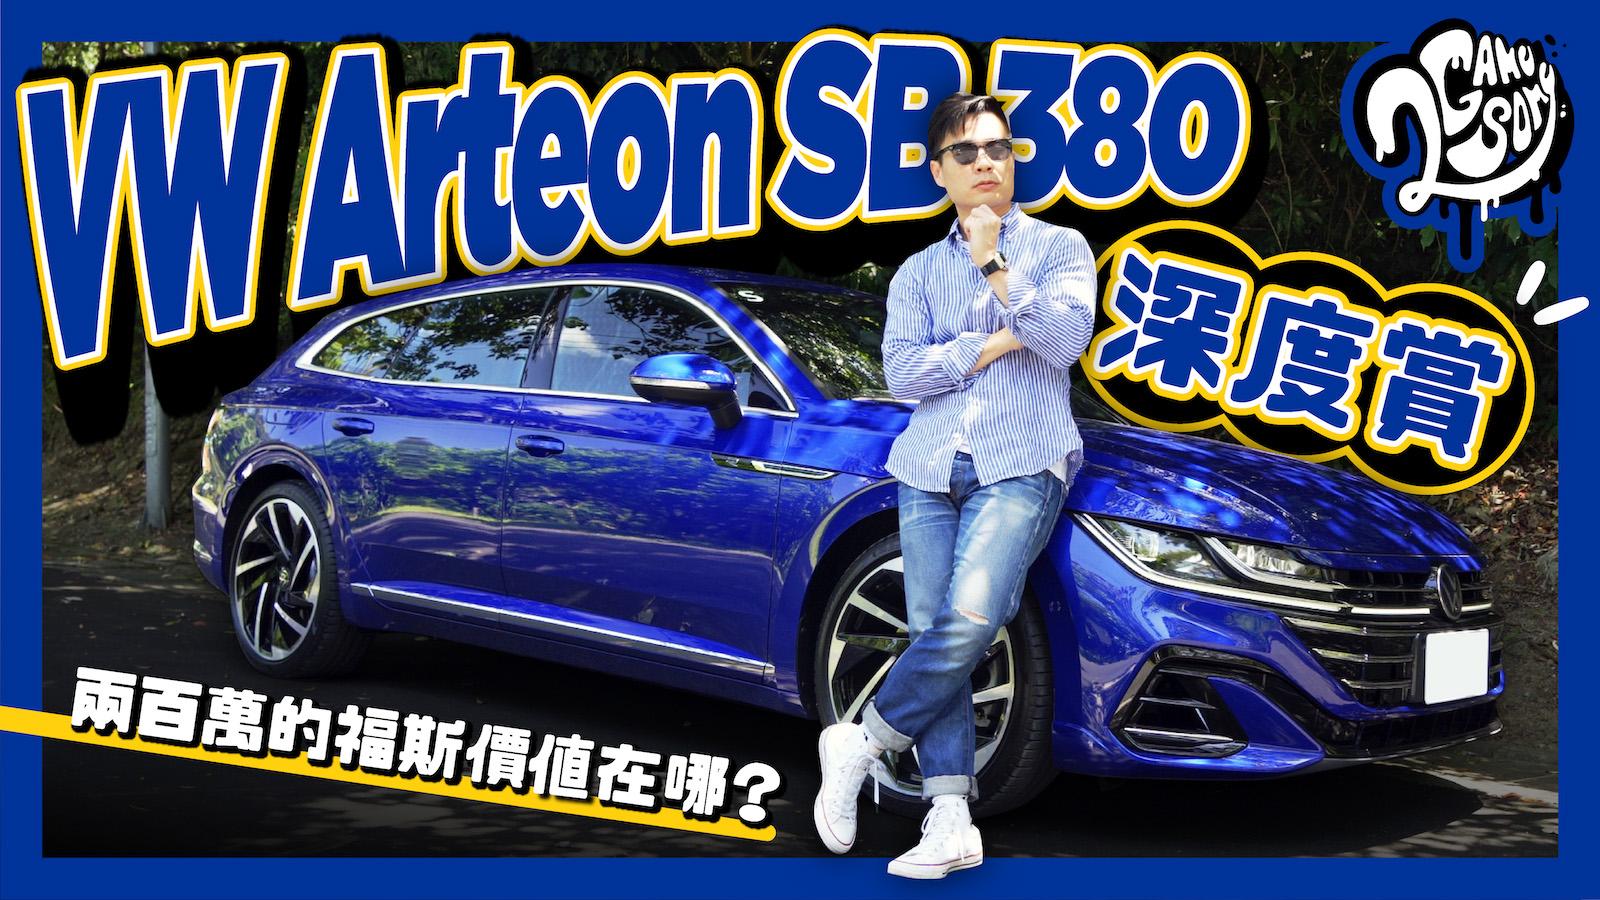 VW Arteon Shooting Brake 380 深度賞|200 萬的價值何在?